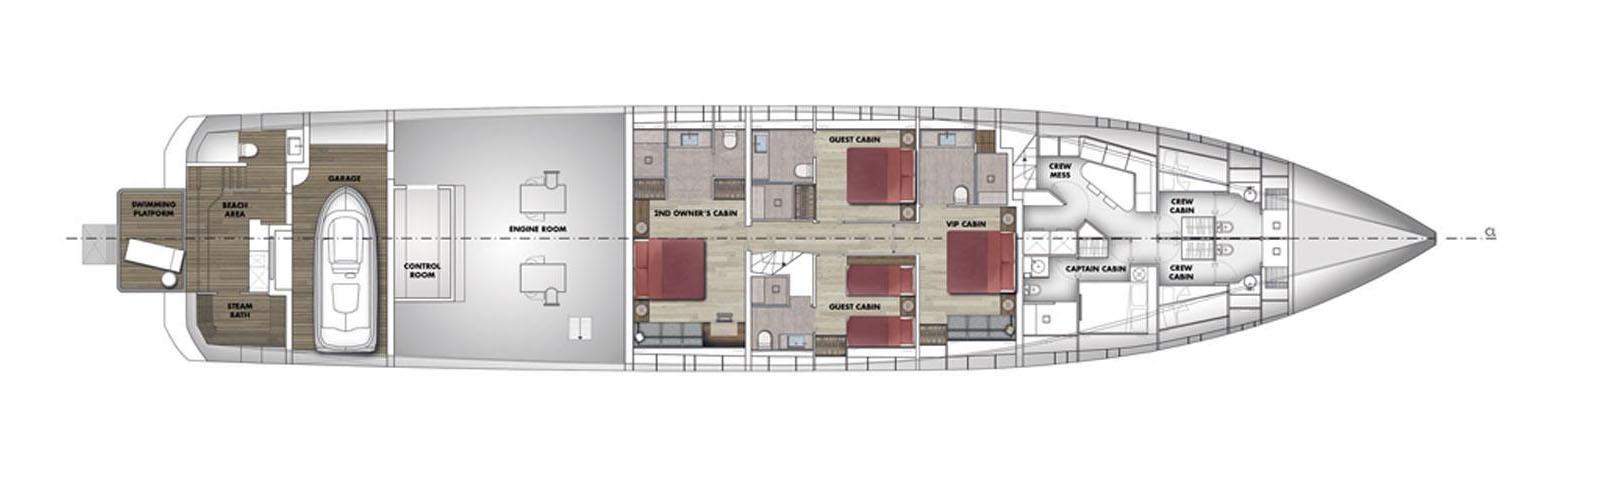 jedi-deck-plan-lower-deck-h.jpg